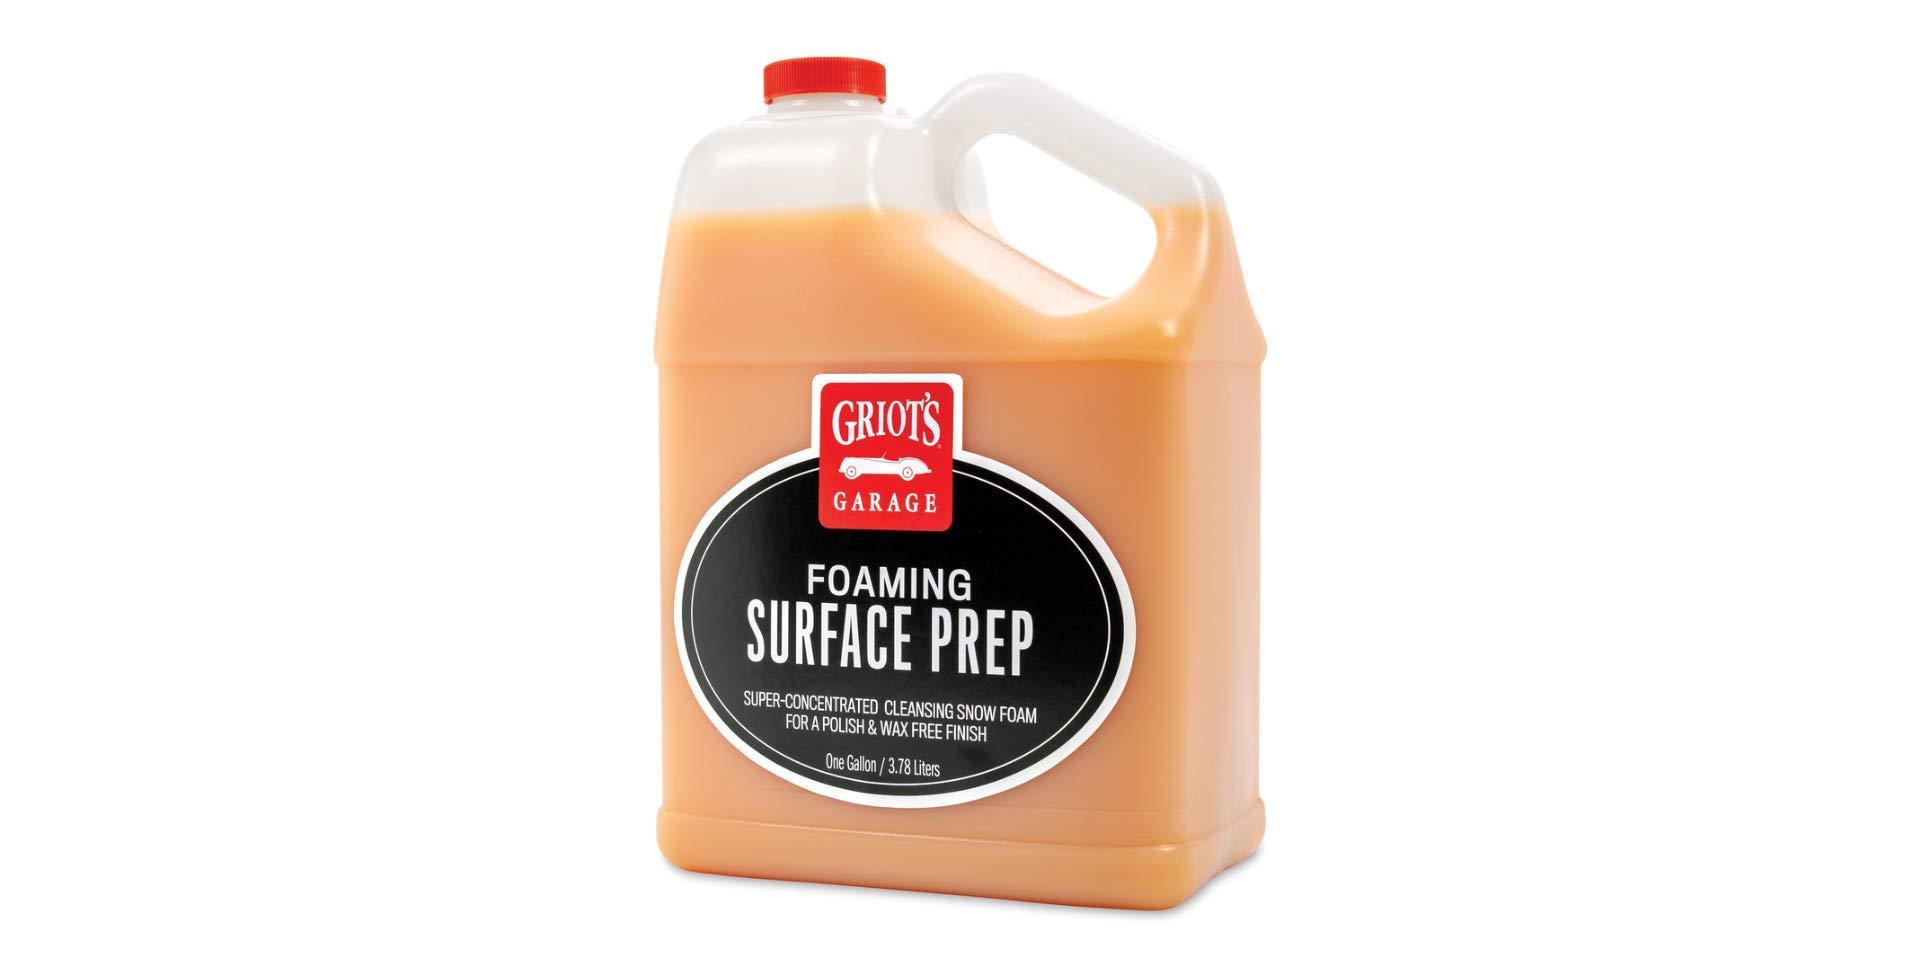 Griot's Garage B3101 BOSS Foaming Surface Prep Gallon